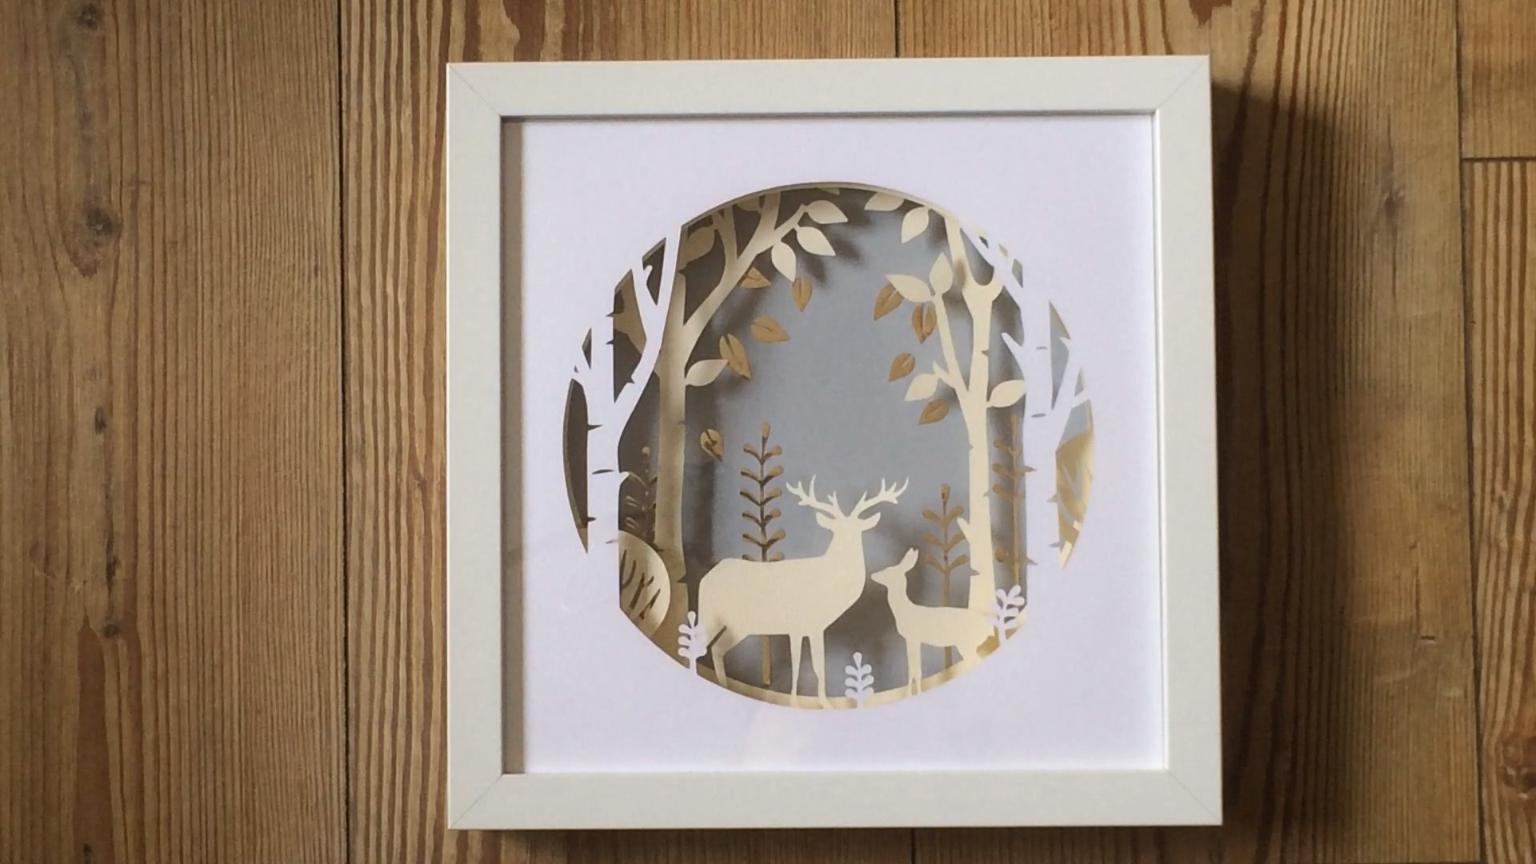 A musthave home decor gem diy paper design kit from chipola studio